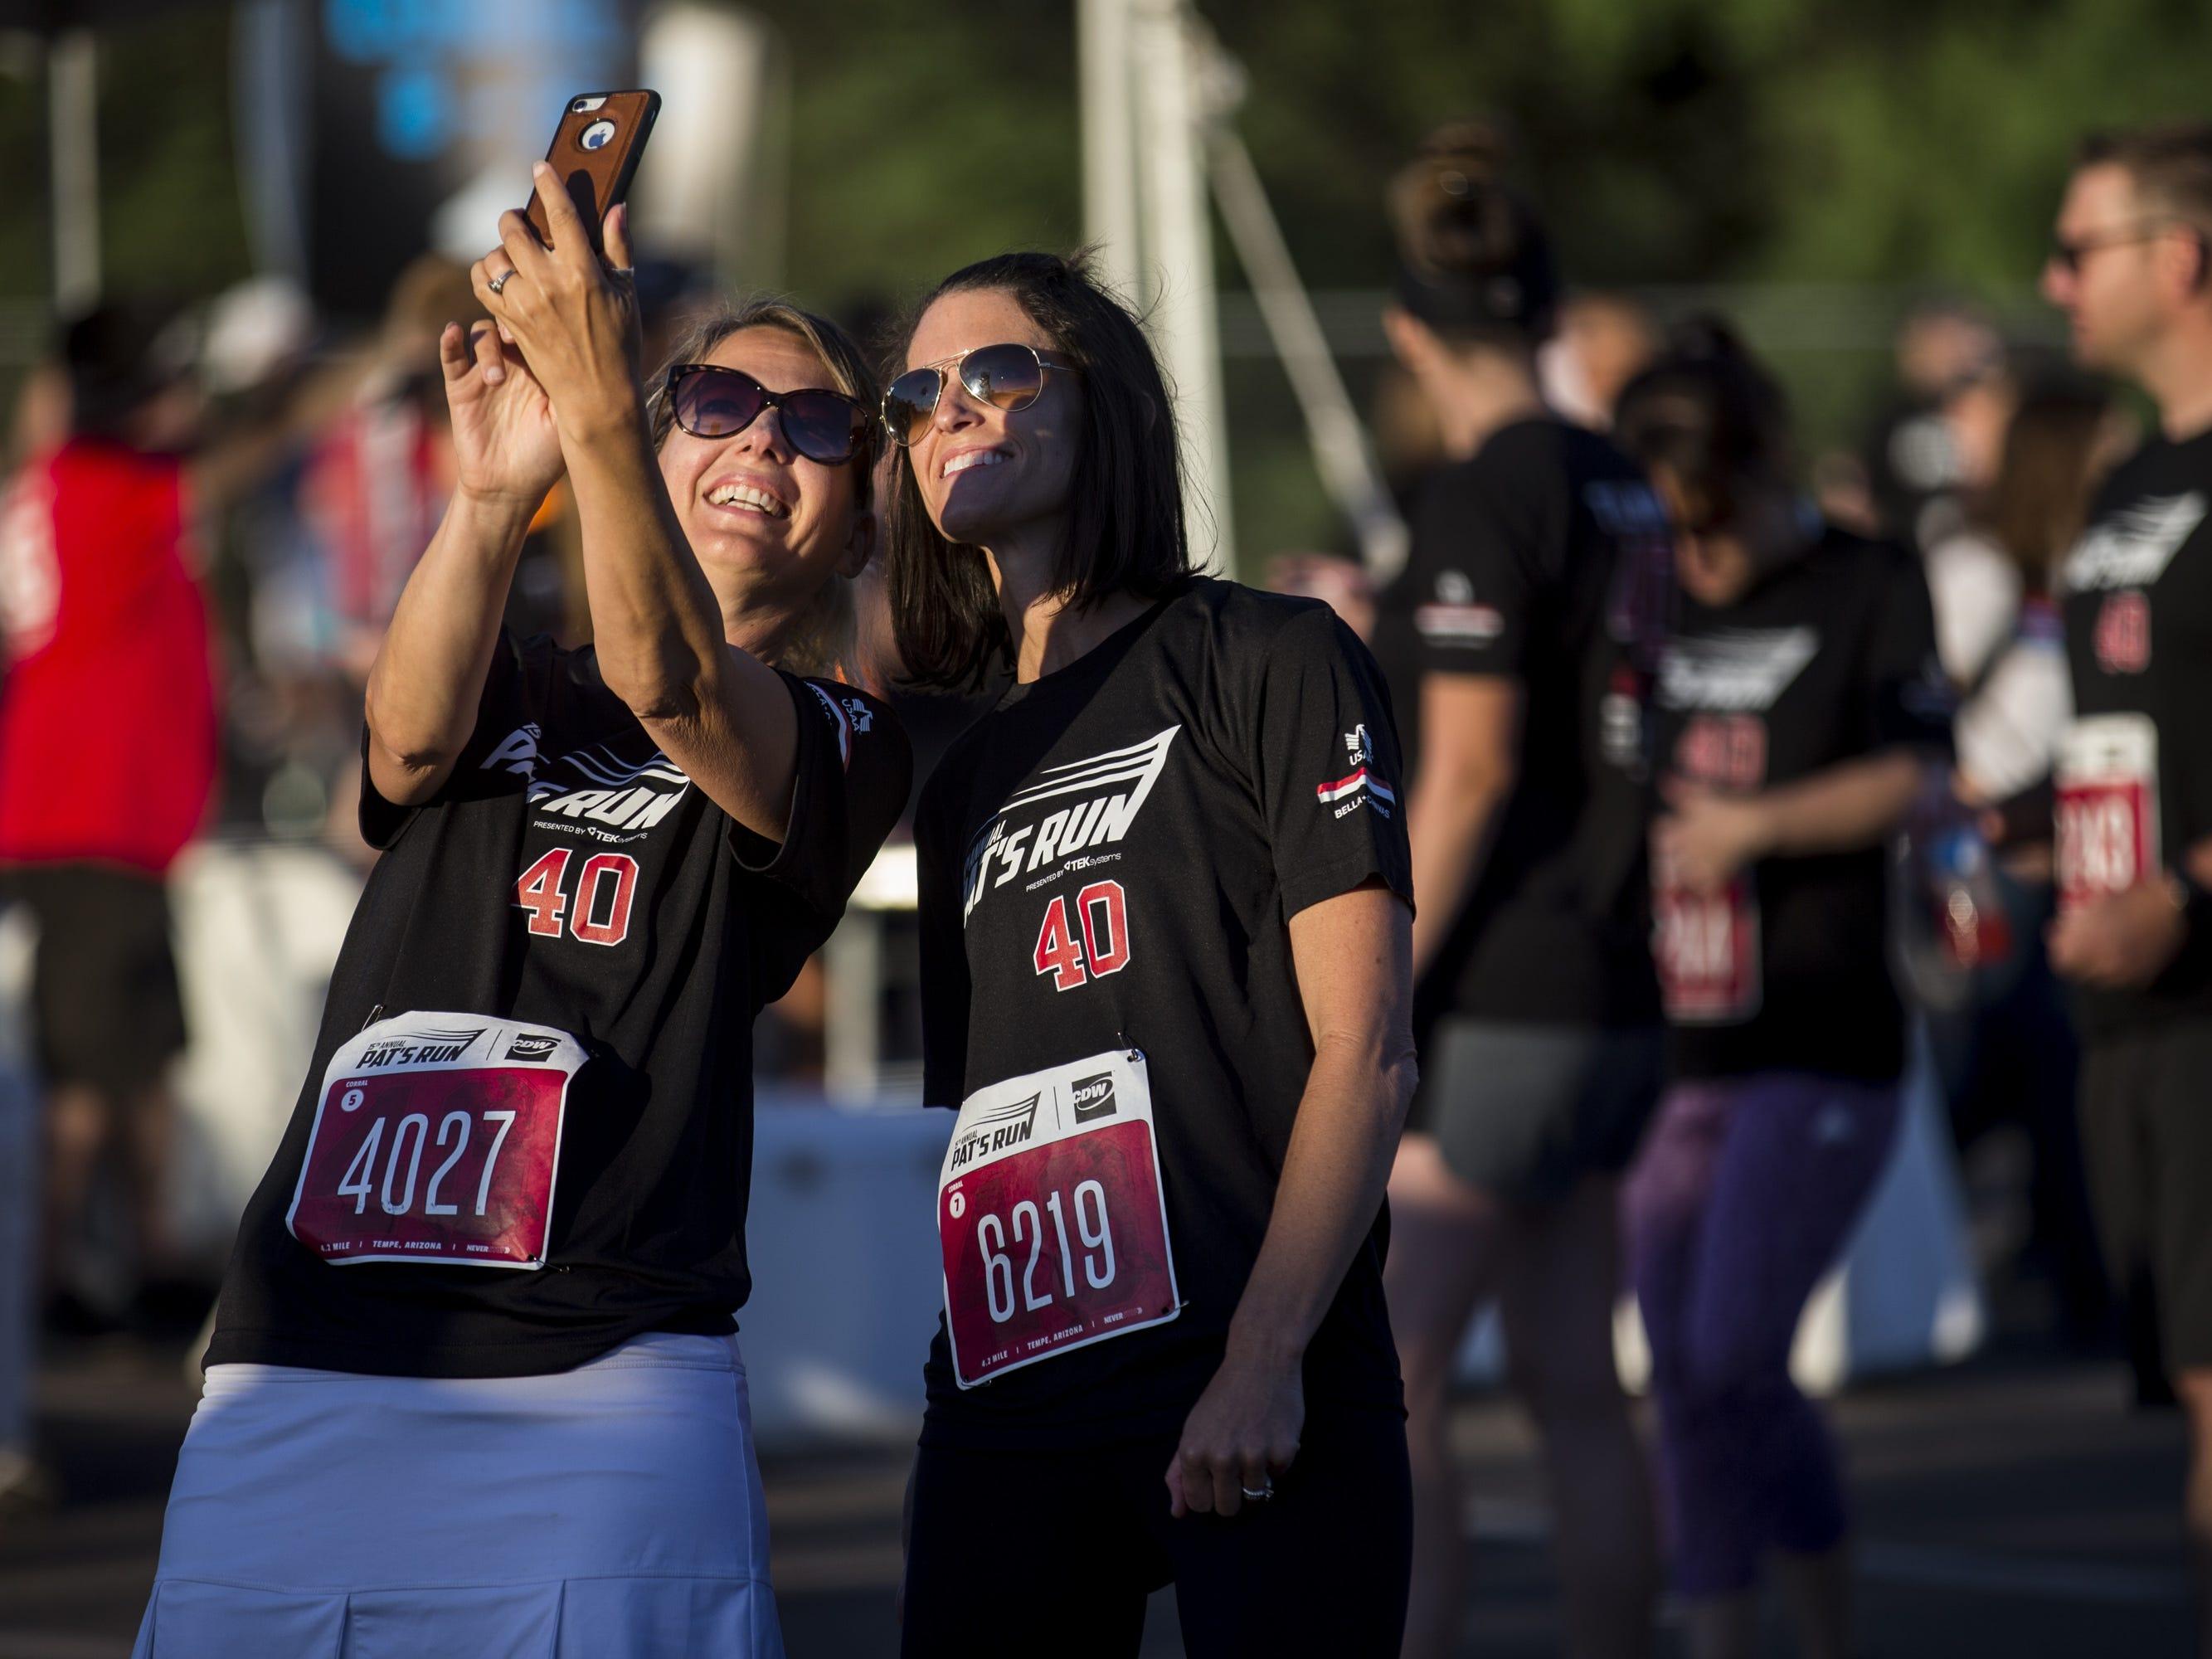 Participants take photos before the 15th Annual Pat's Run on Saturday, April 27, 2019, in Tempe, Ariz.